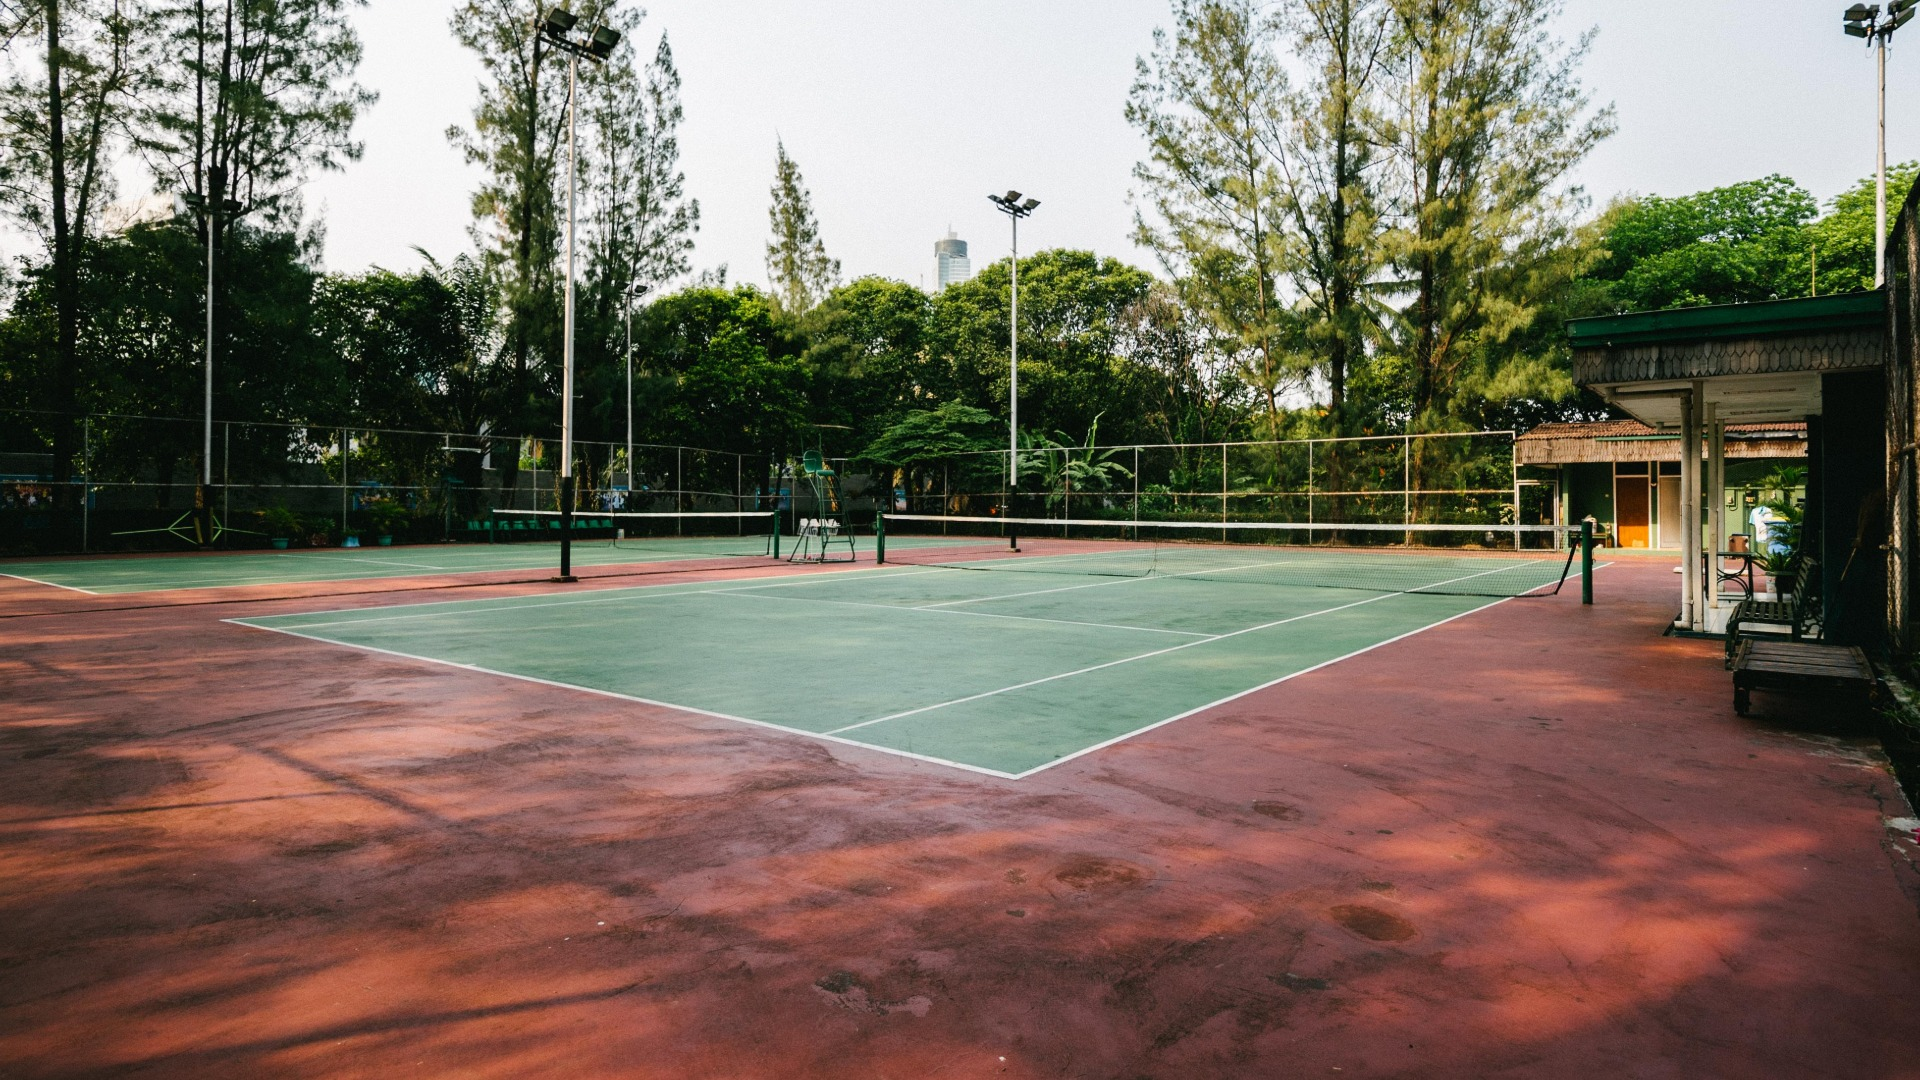 Patra Kuningan Tennis Court (Court C)